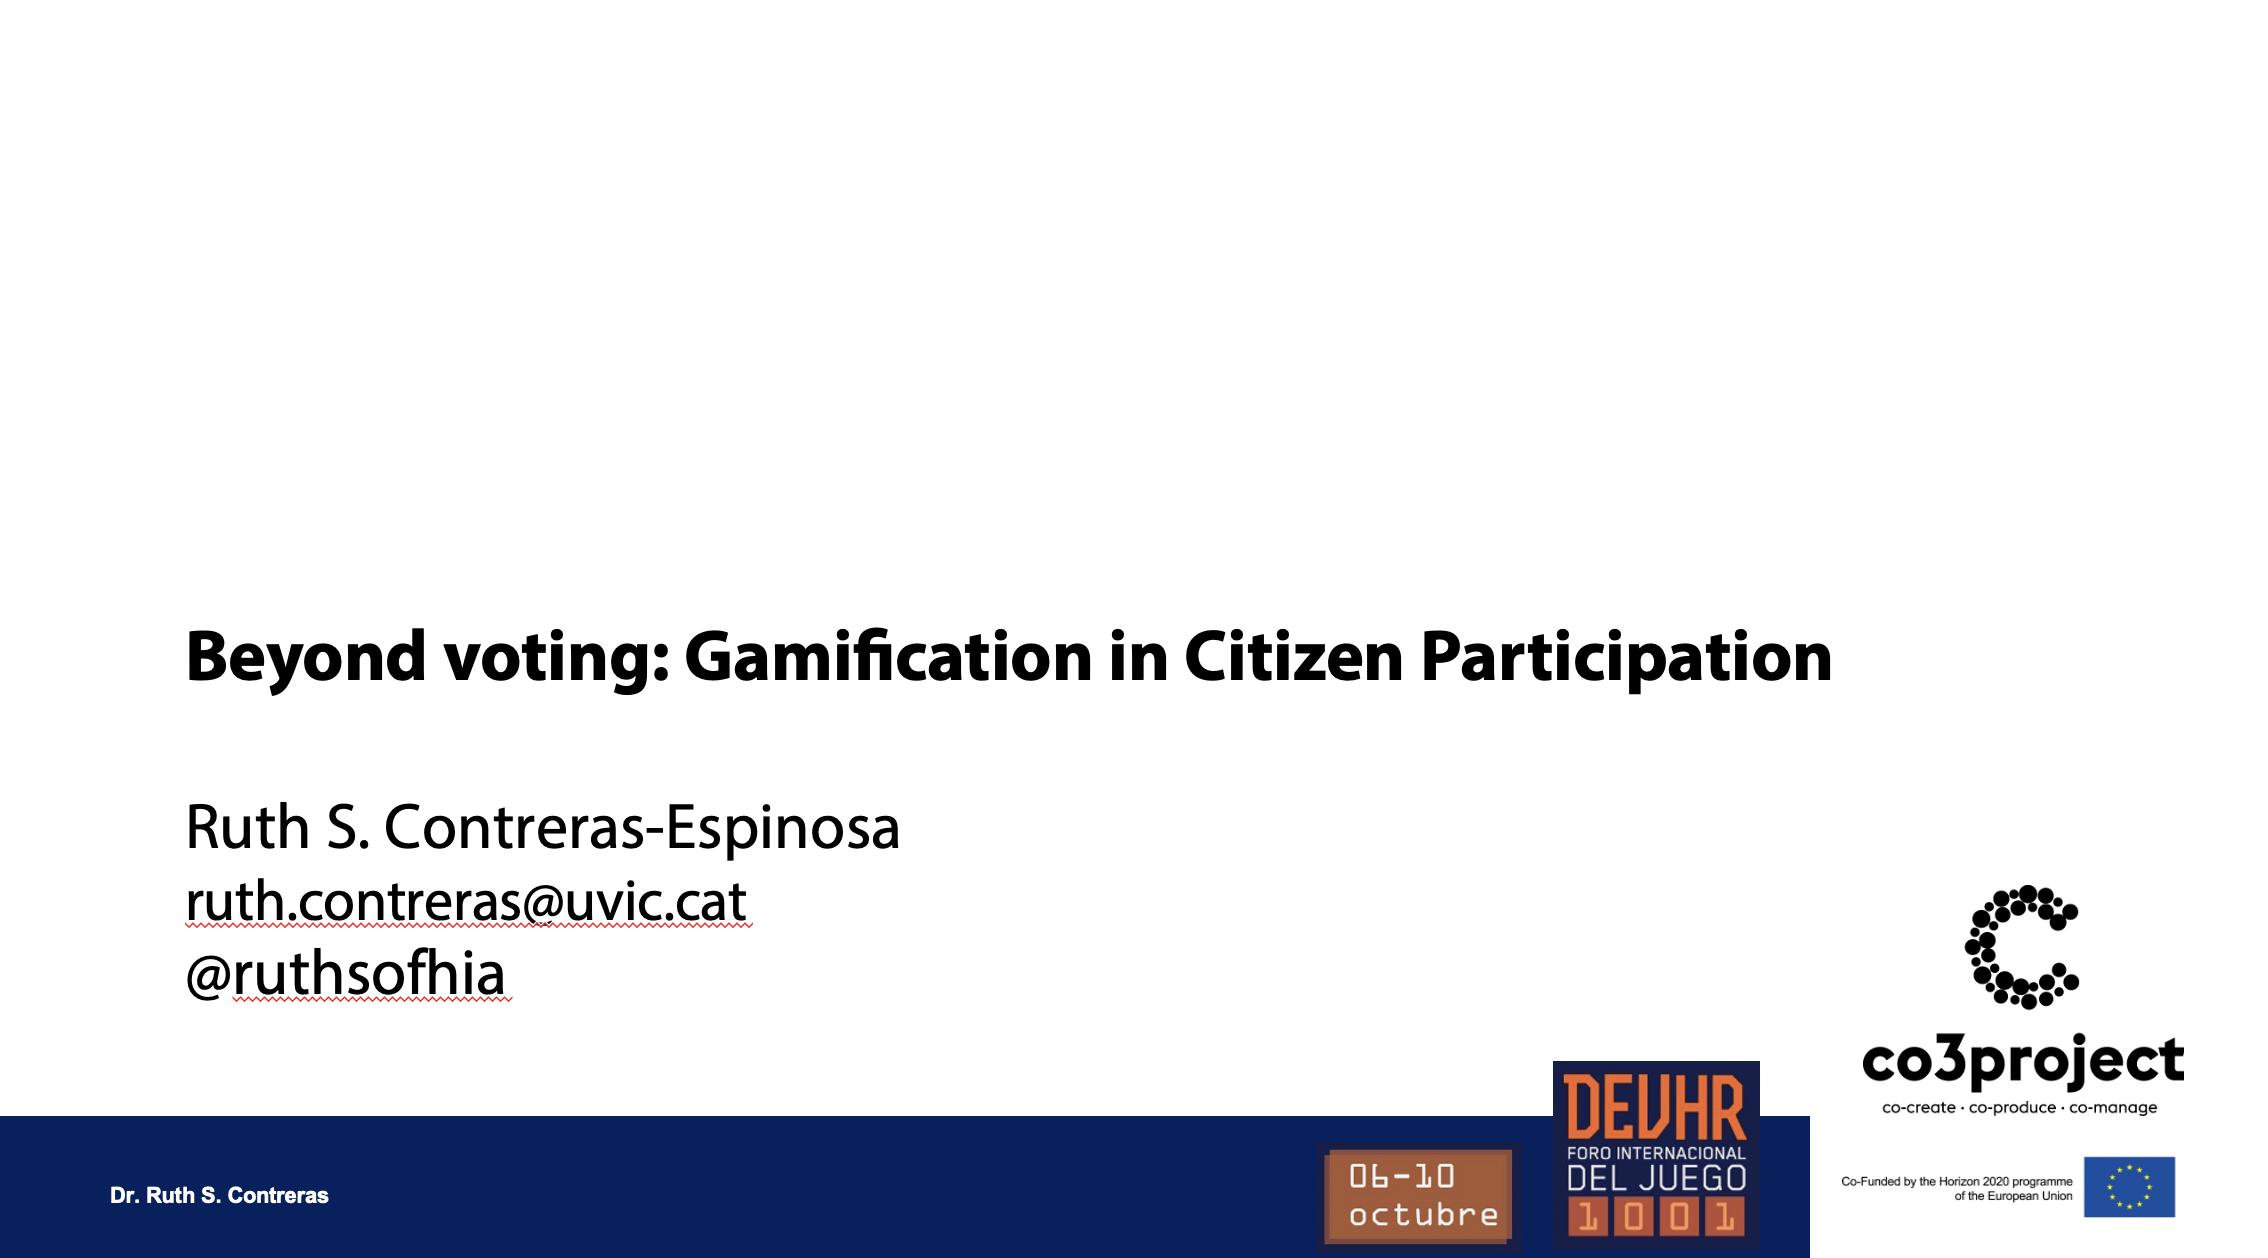 Participation at the DEVHR 2020 Forum. Beyond voting: Gamification in Citizen Participation